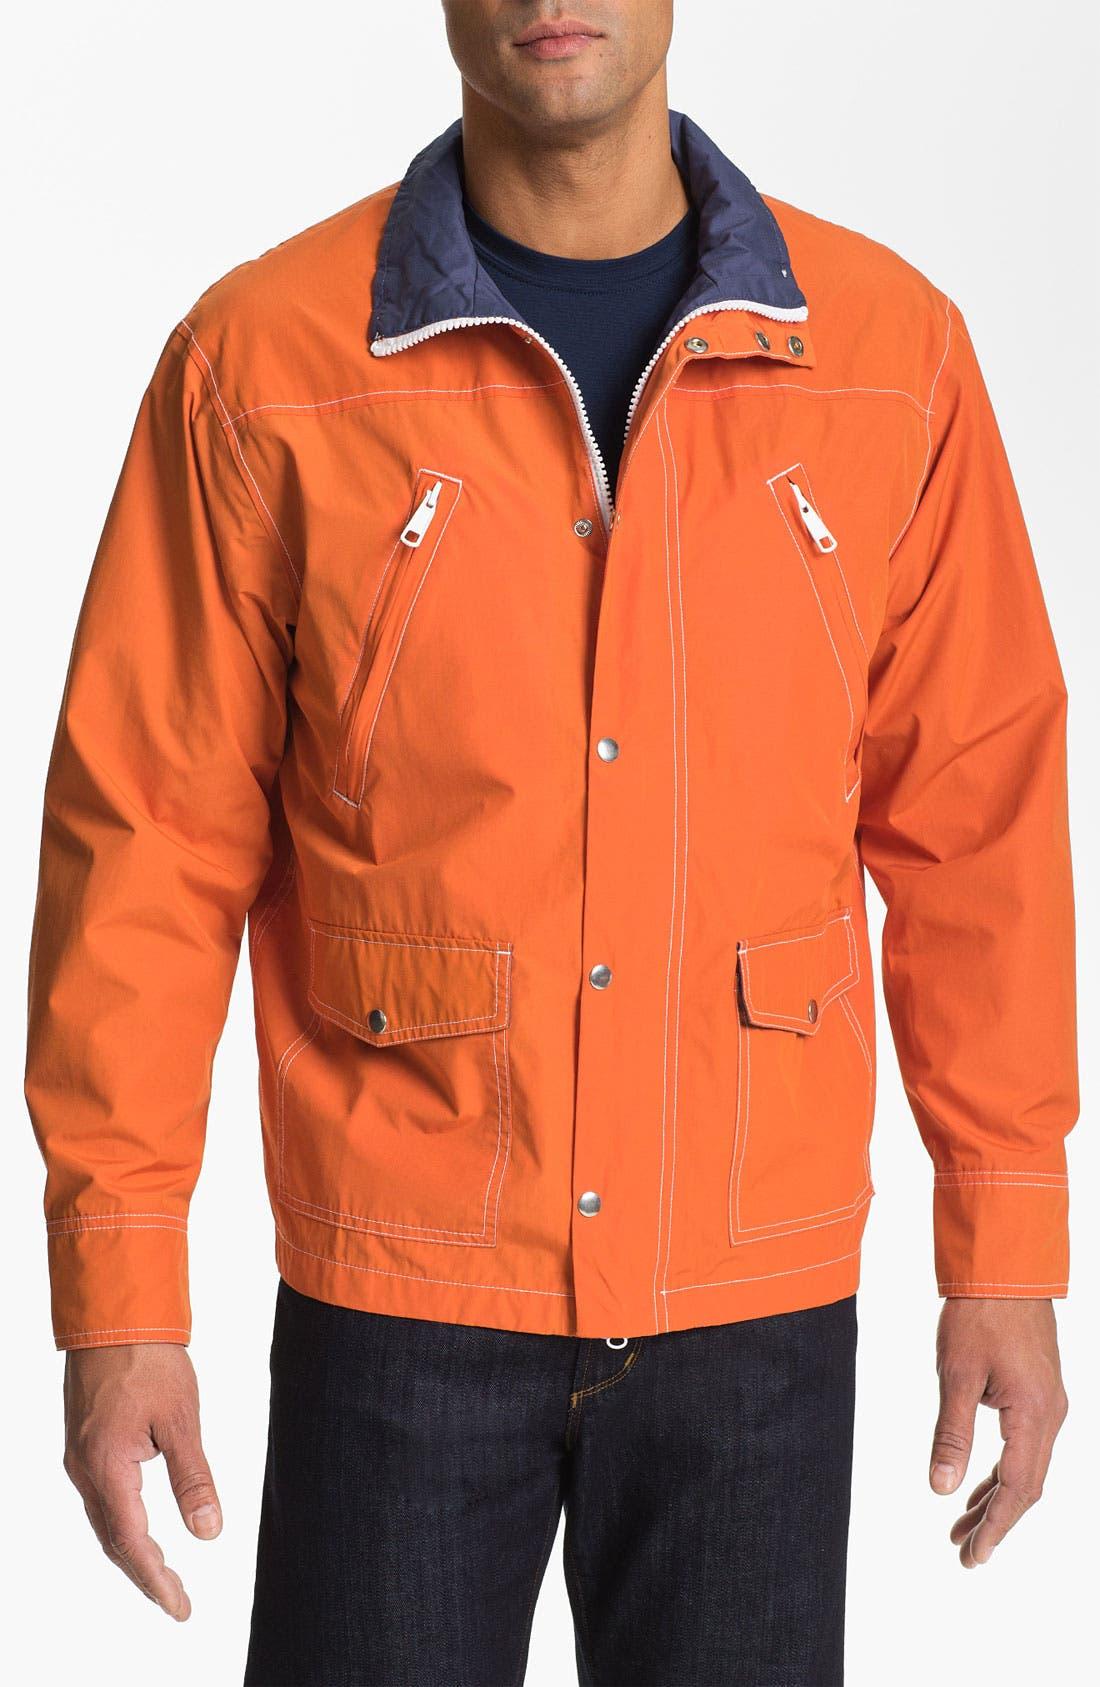 Main Image - Cutter & Buck 'North Beach Spring' Jacket (Big & Tall)